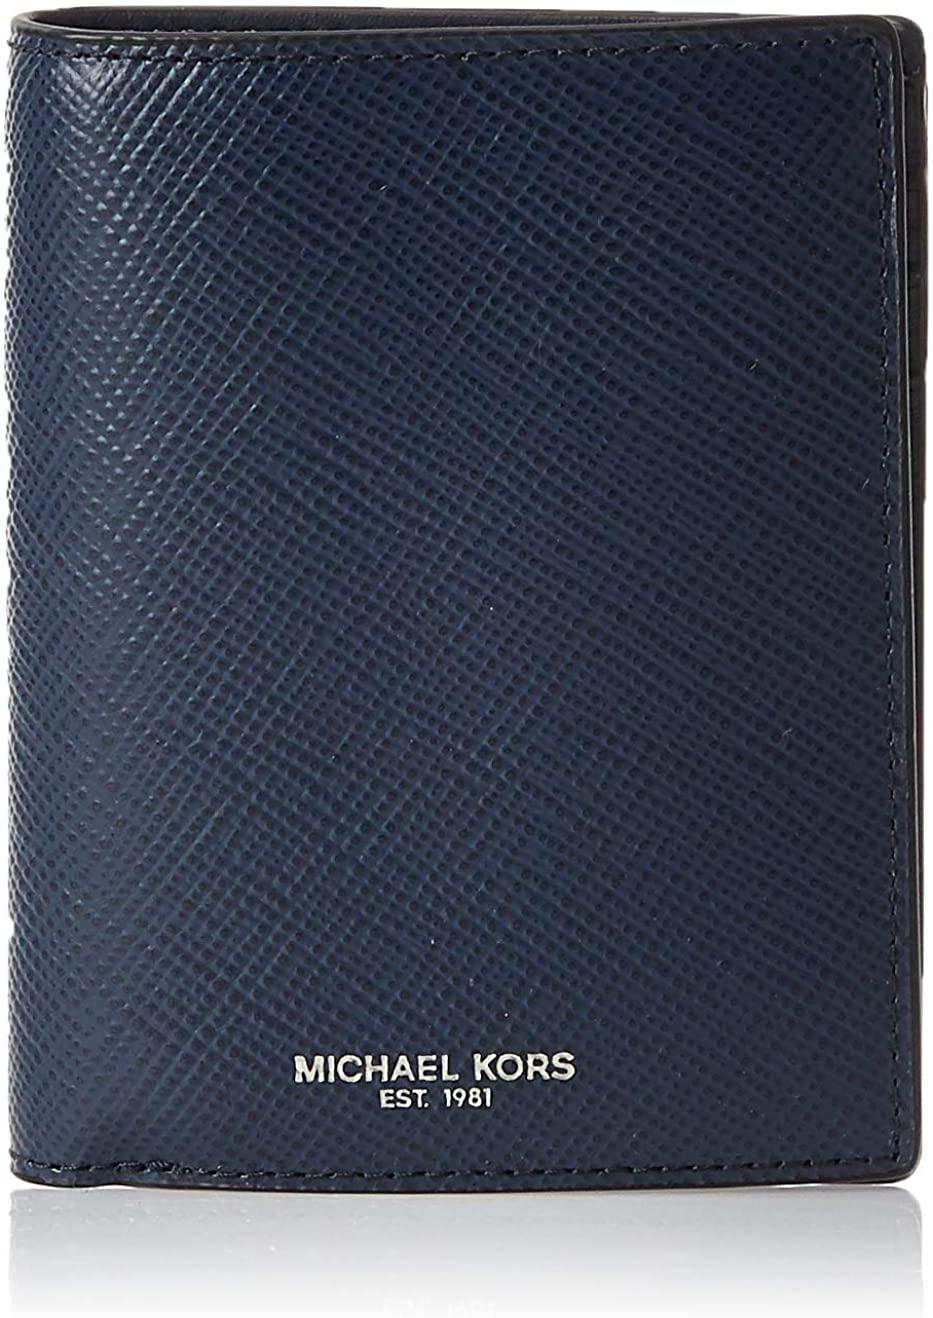 Michael Kors Men's Harrison Leather Card Case